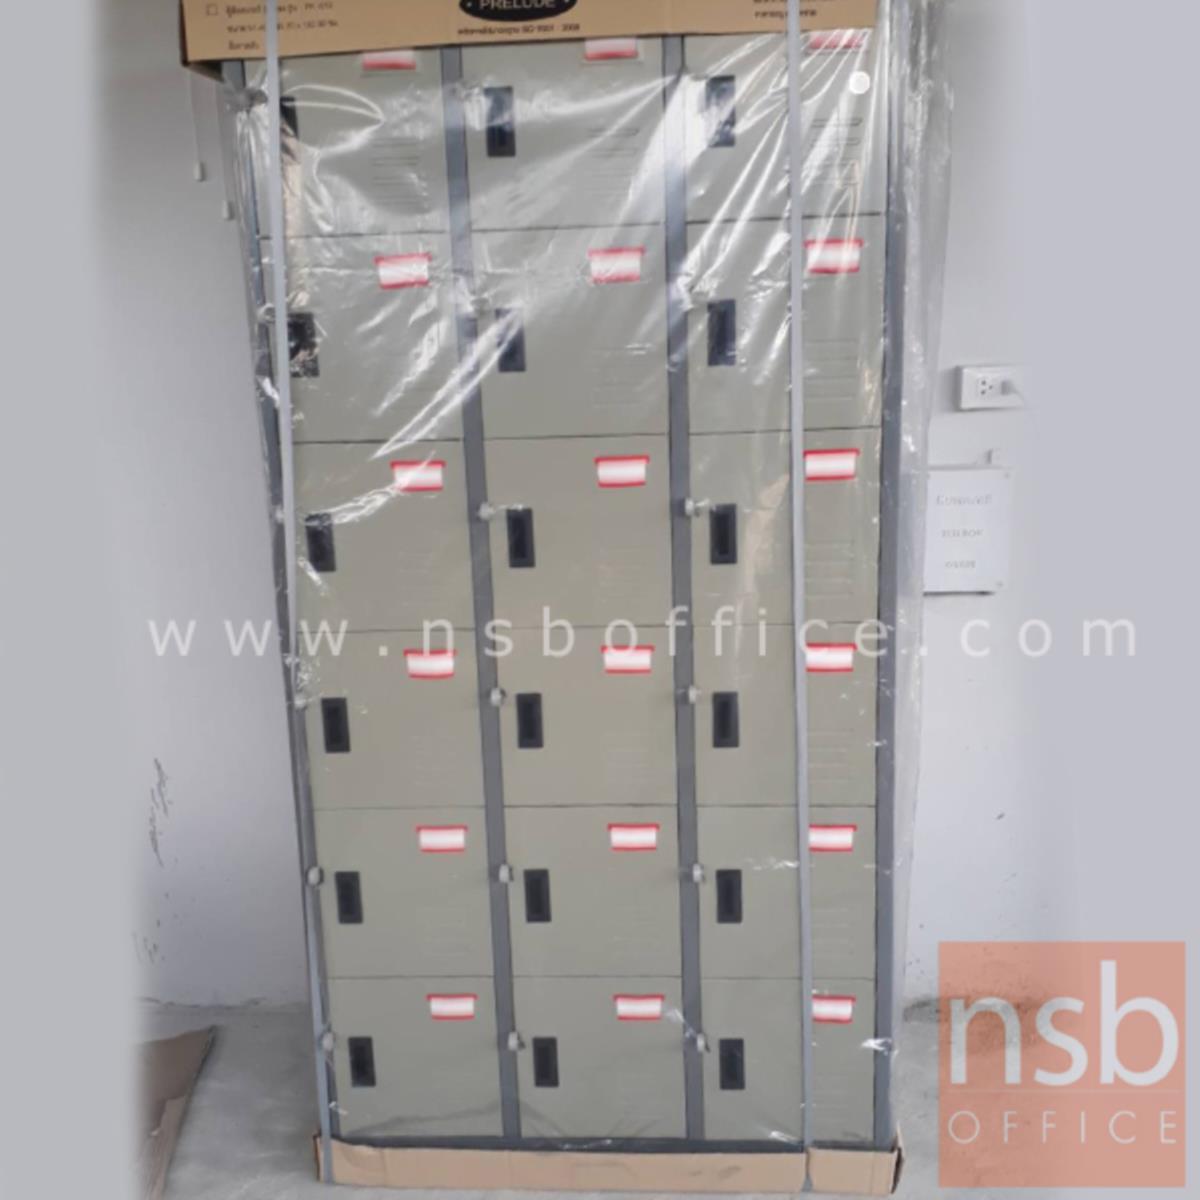 E04A023: ตู้ล็อกเกอร์ 18 ประตู มี มอก. รุ่น LK-018